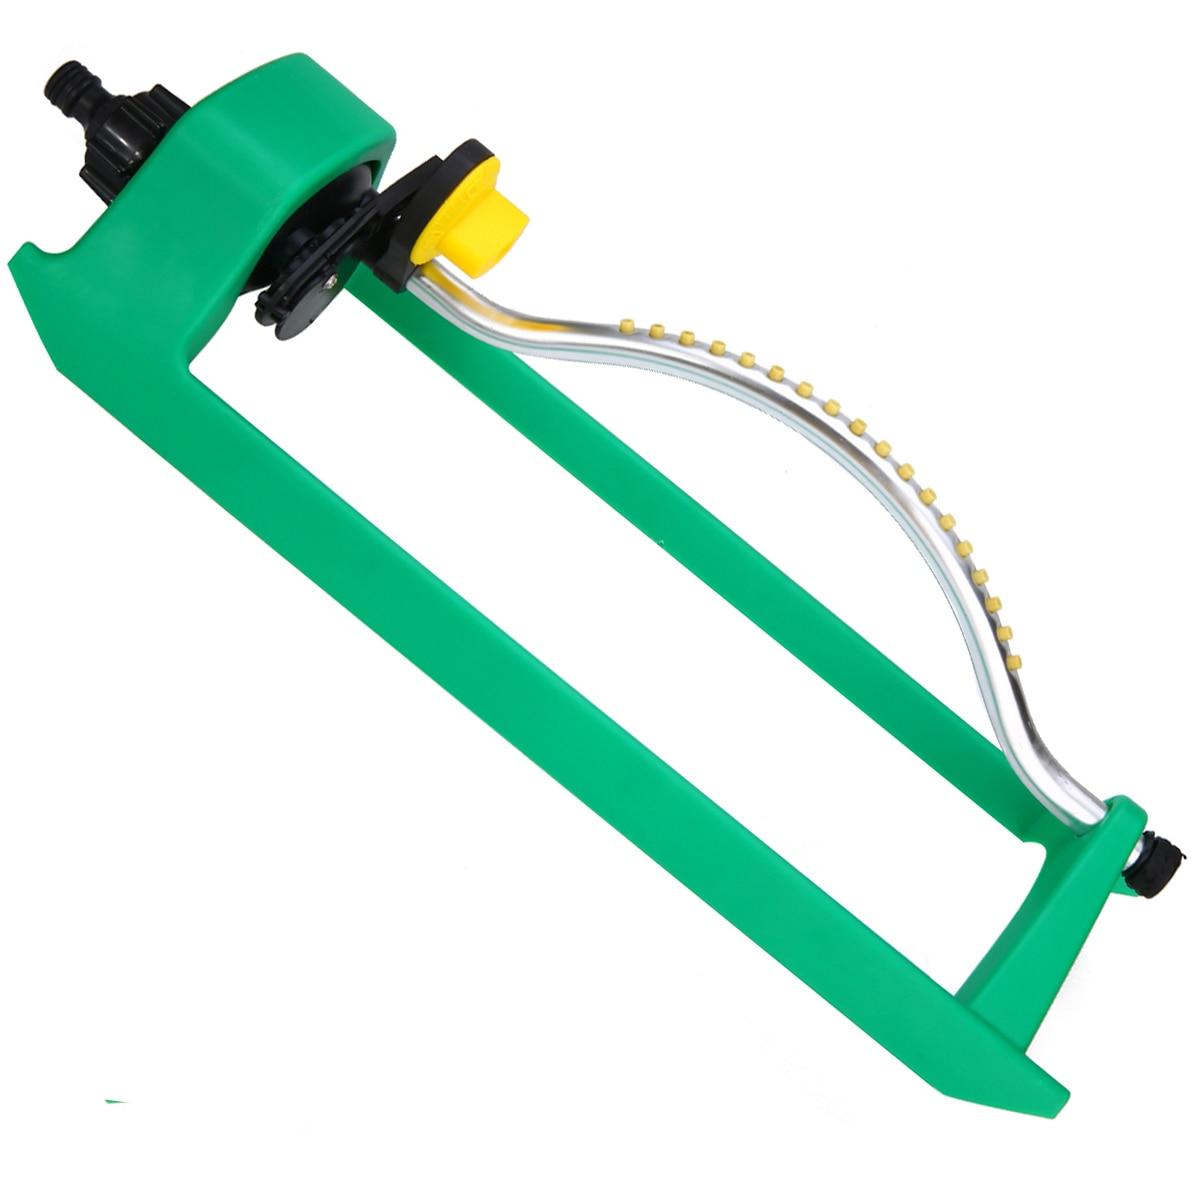 Image 3 - 18Jets Oscillating Lawn Water Sprinkler Watering Garden Pipe Hose Water Flow-in Garden Sprinklers from Home & Garden